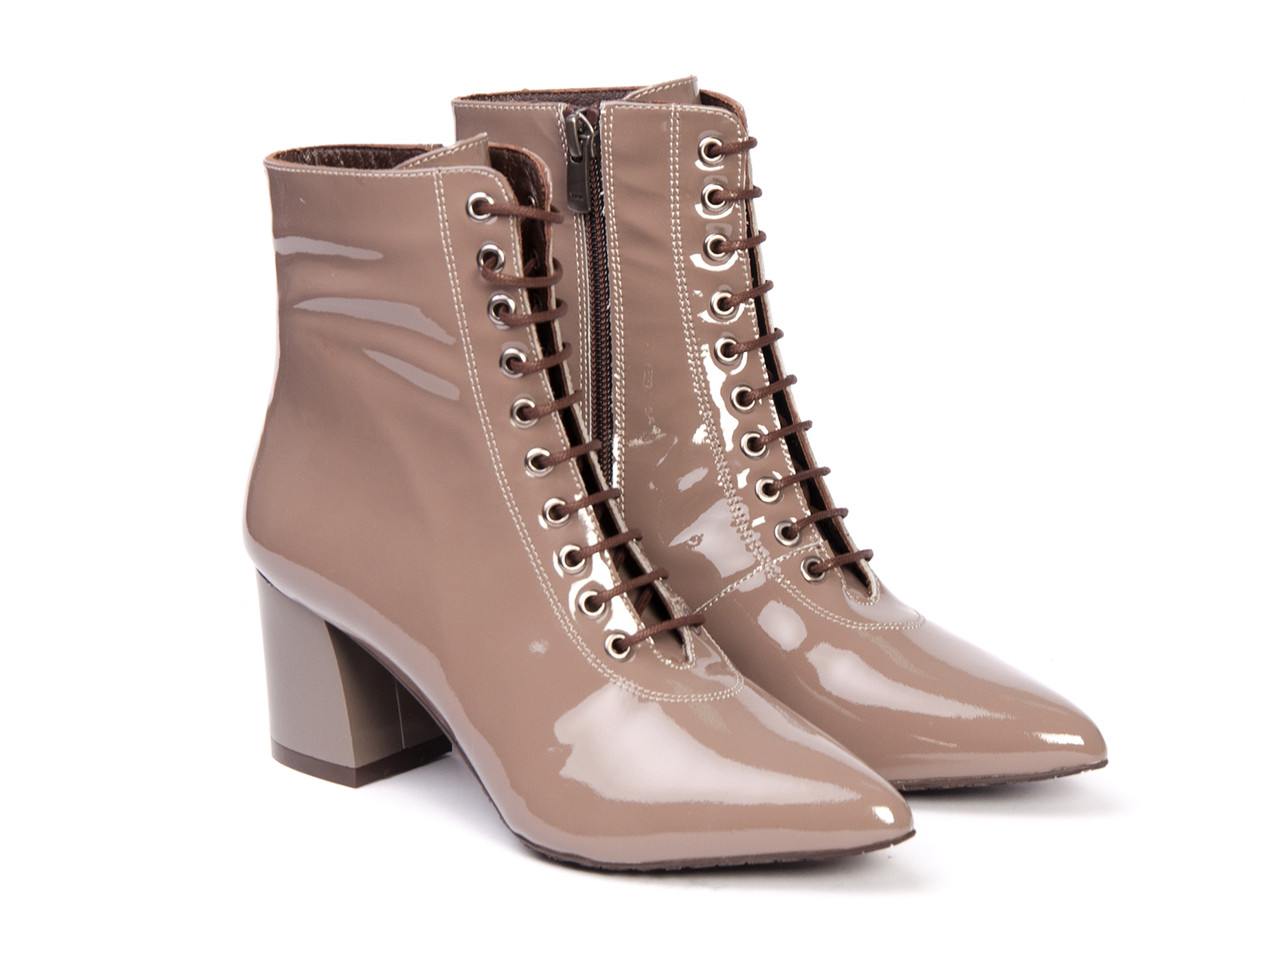 Ботинки Etor 4409-09-6775-1405 бежевые